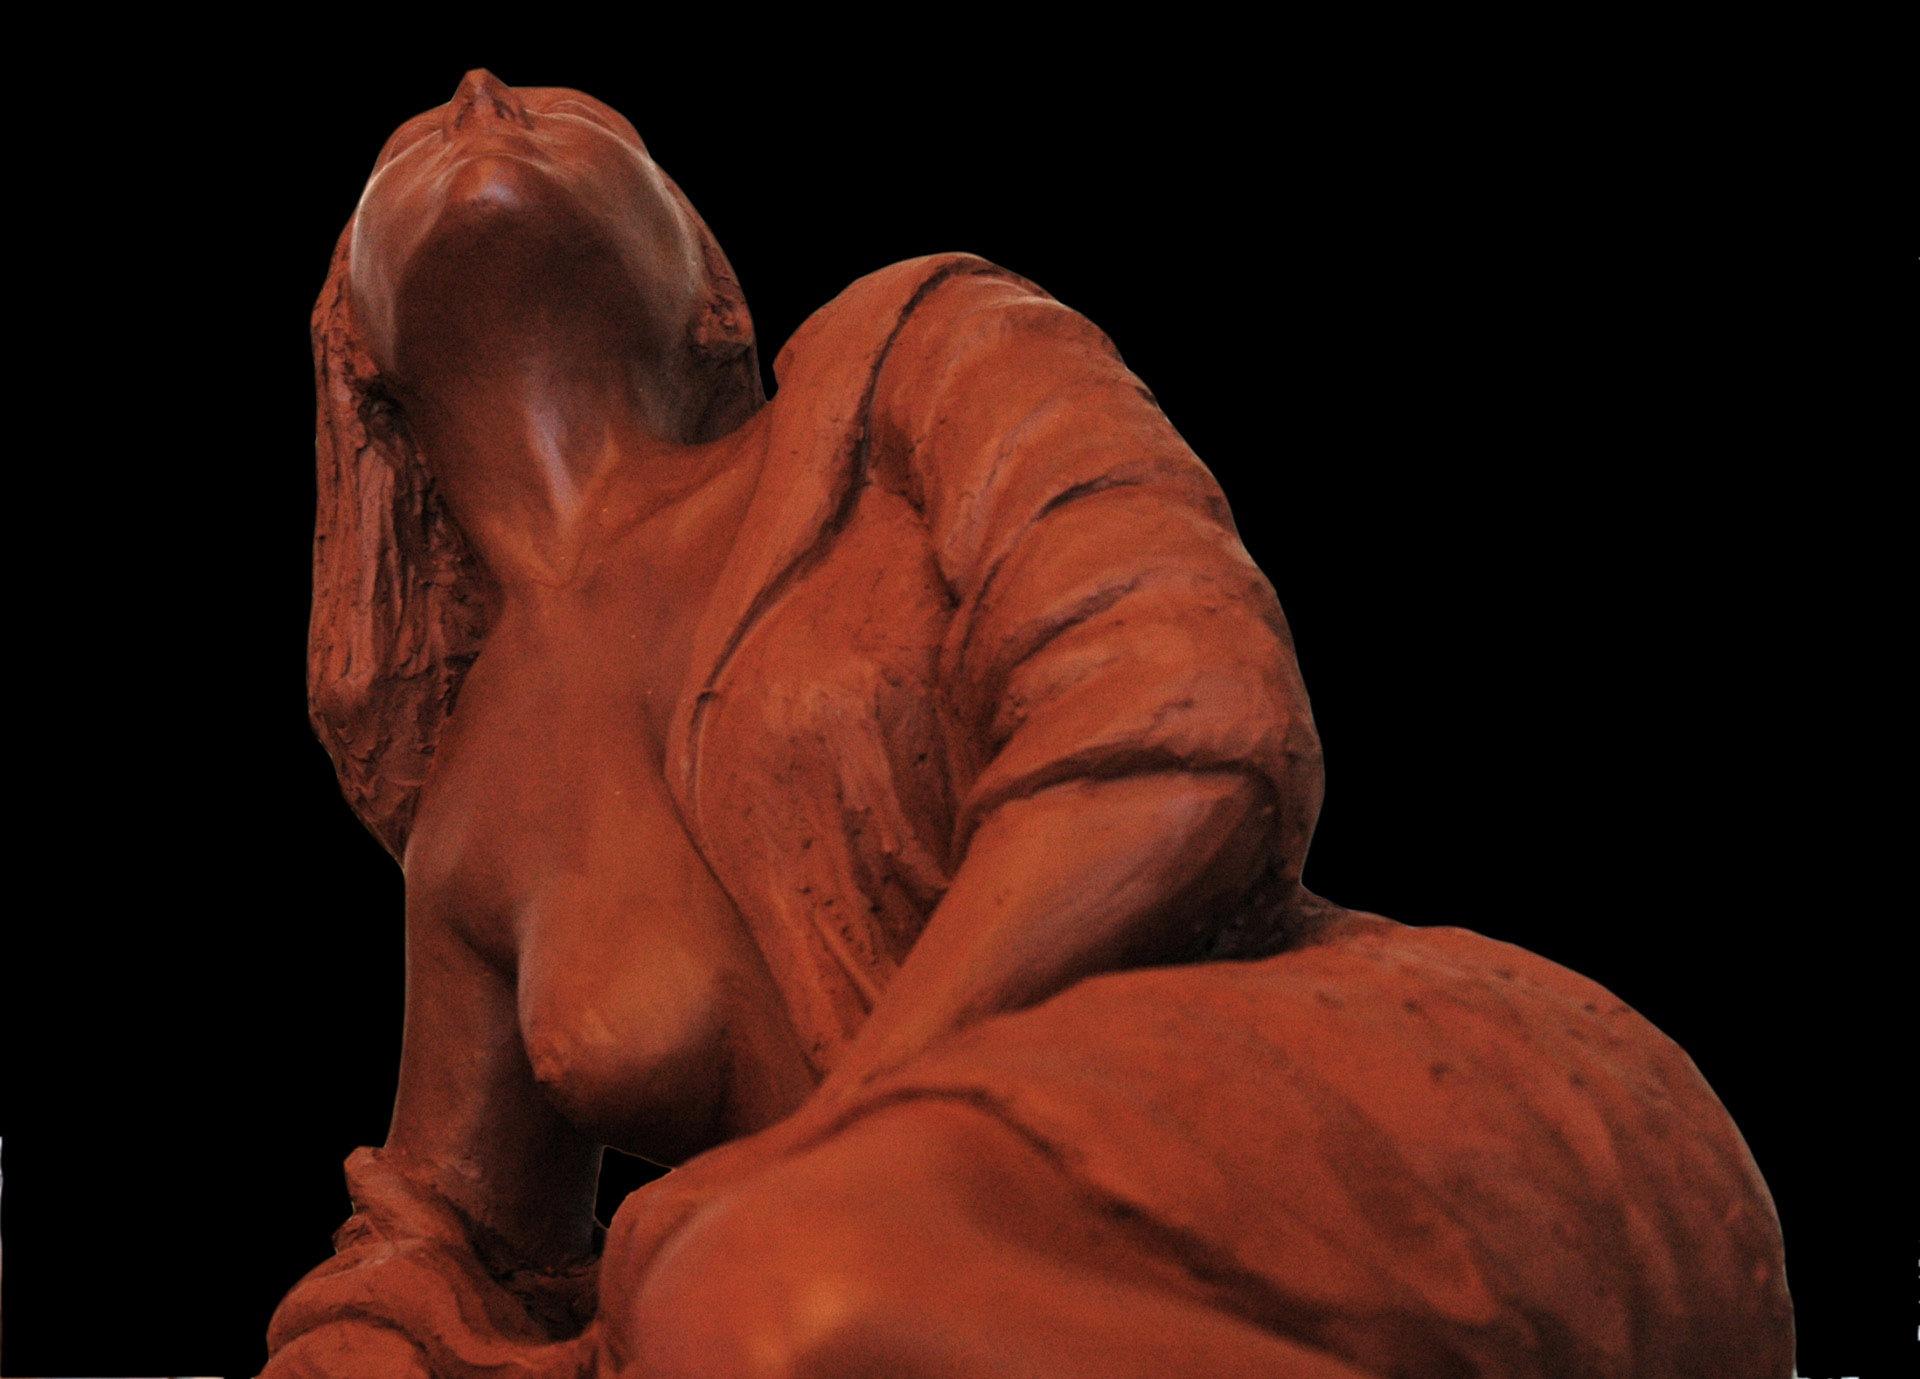 Sin título. Arcilla, 15 x 15 cm, Javier Olmedo. 2004